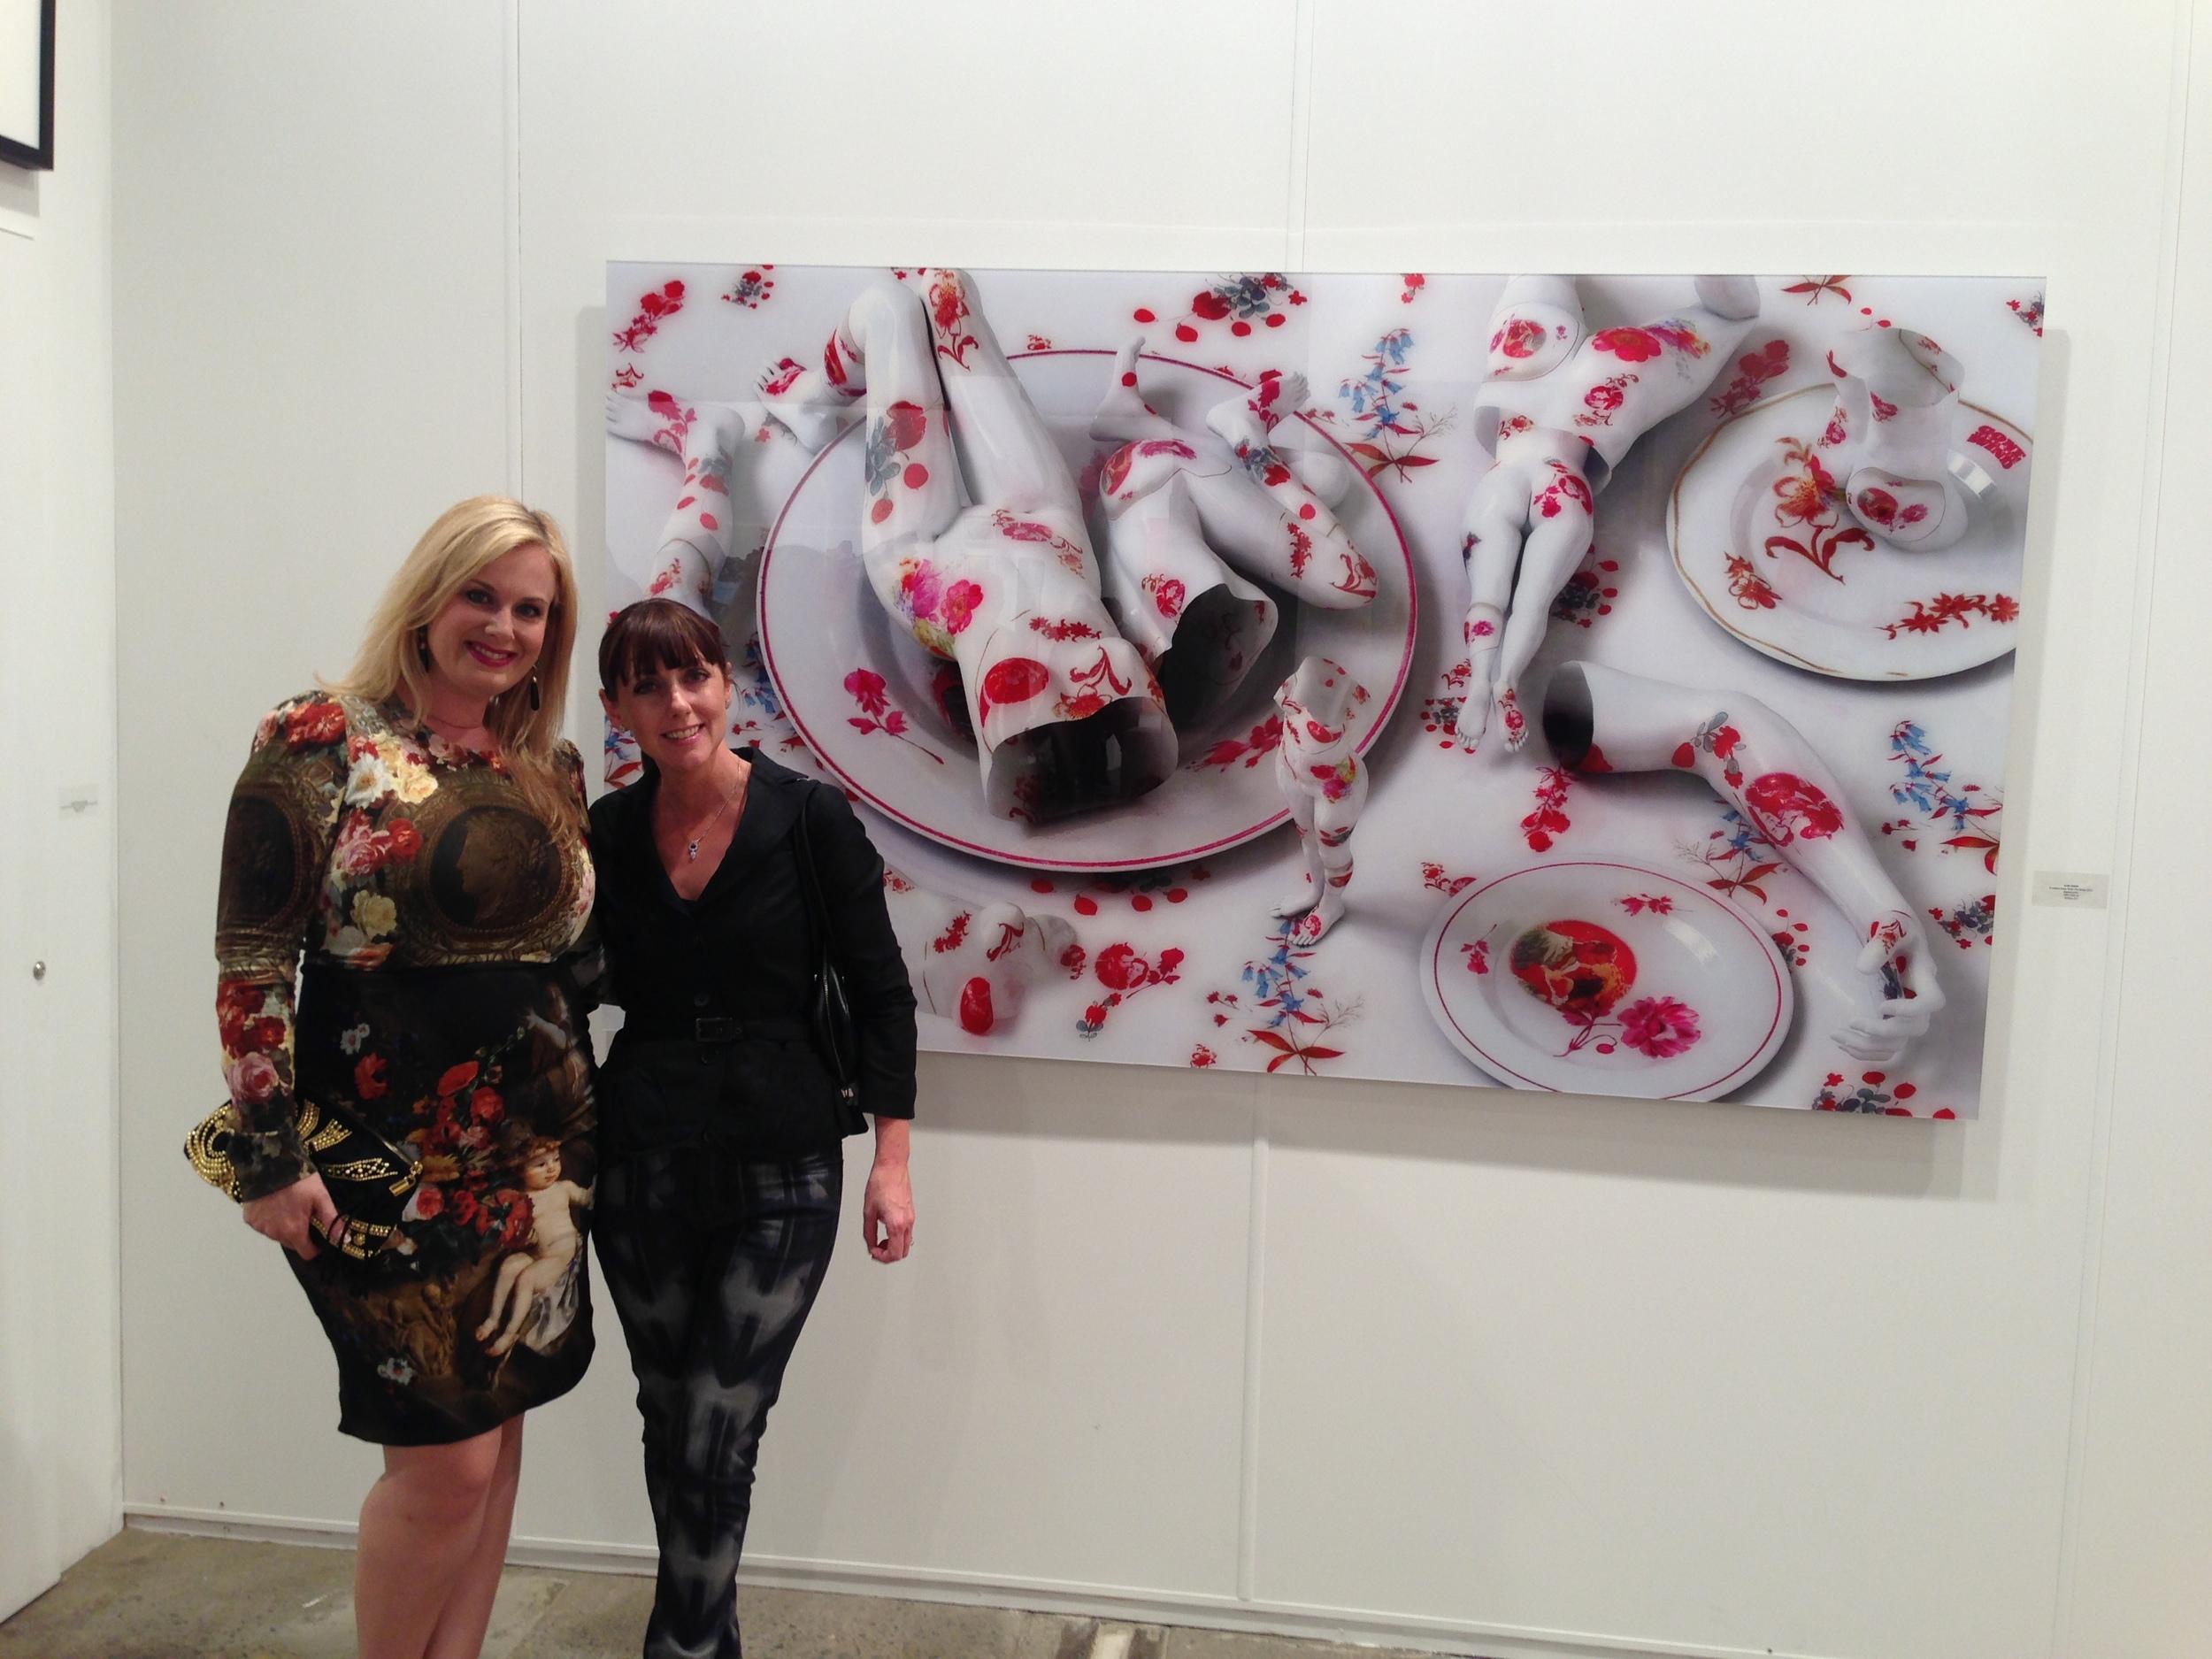 Viewing Kim Joon's work at Sundaram Tagore Gallery, New York, Hong Kong & Singapore, with Emma Hack at the VIP Collectors Preview